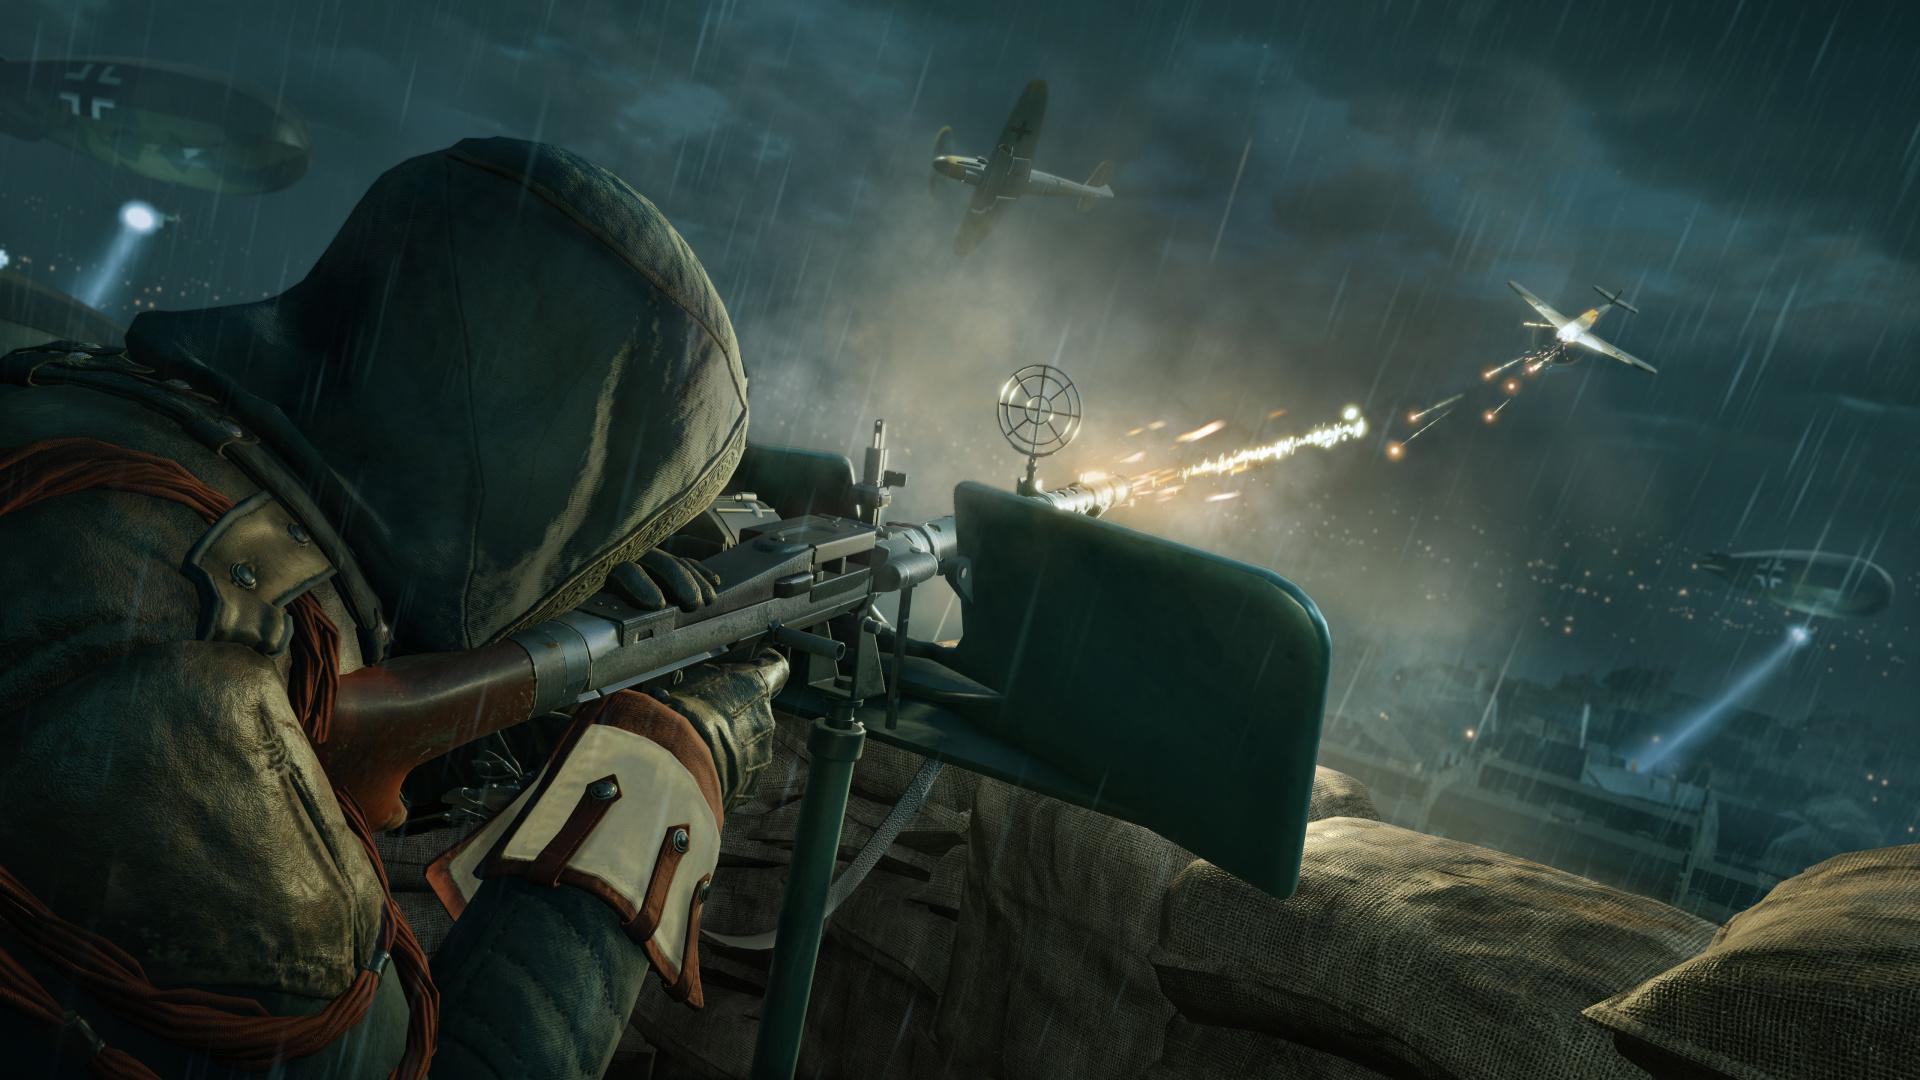 Usa Anime Gun Girl Wallpaper 1920x1080 Assassin S Creed Unity Ps4 Playstation 4 News Reviews